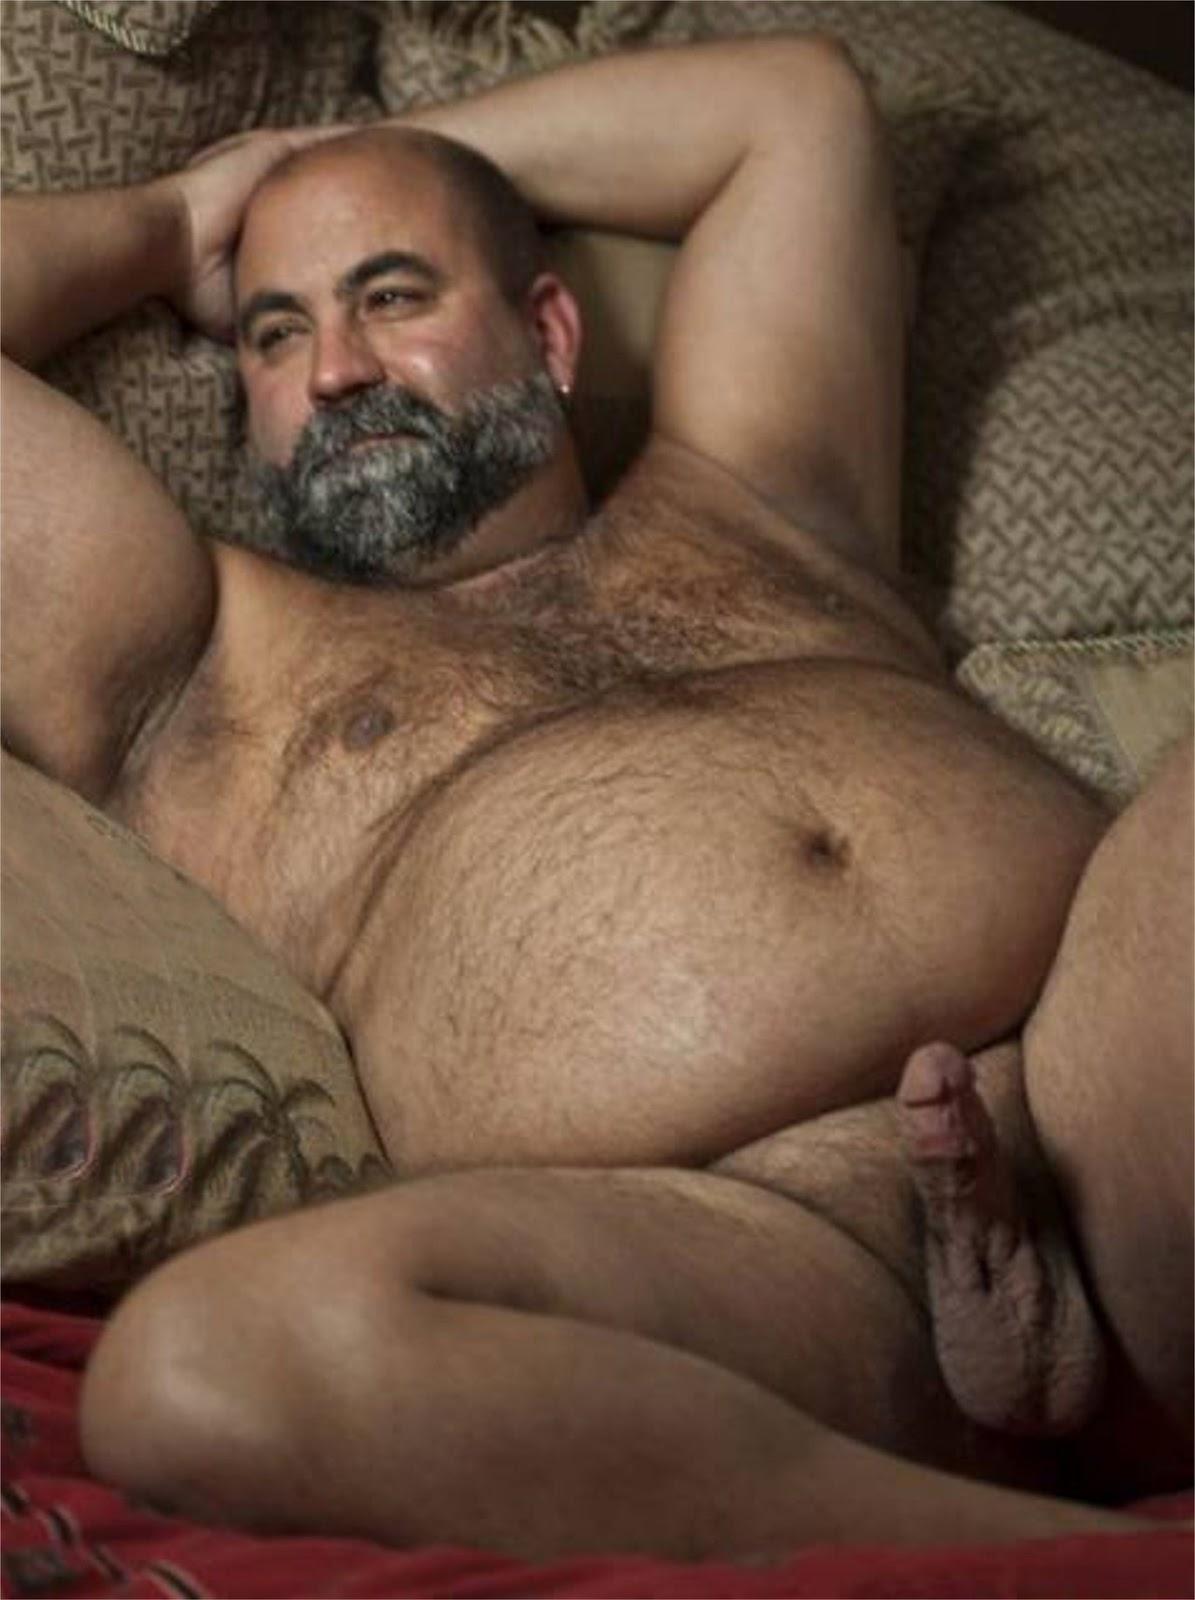 Порно геї старі мужики смотреть онлайн фотоография